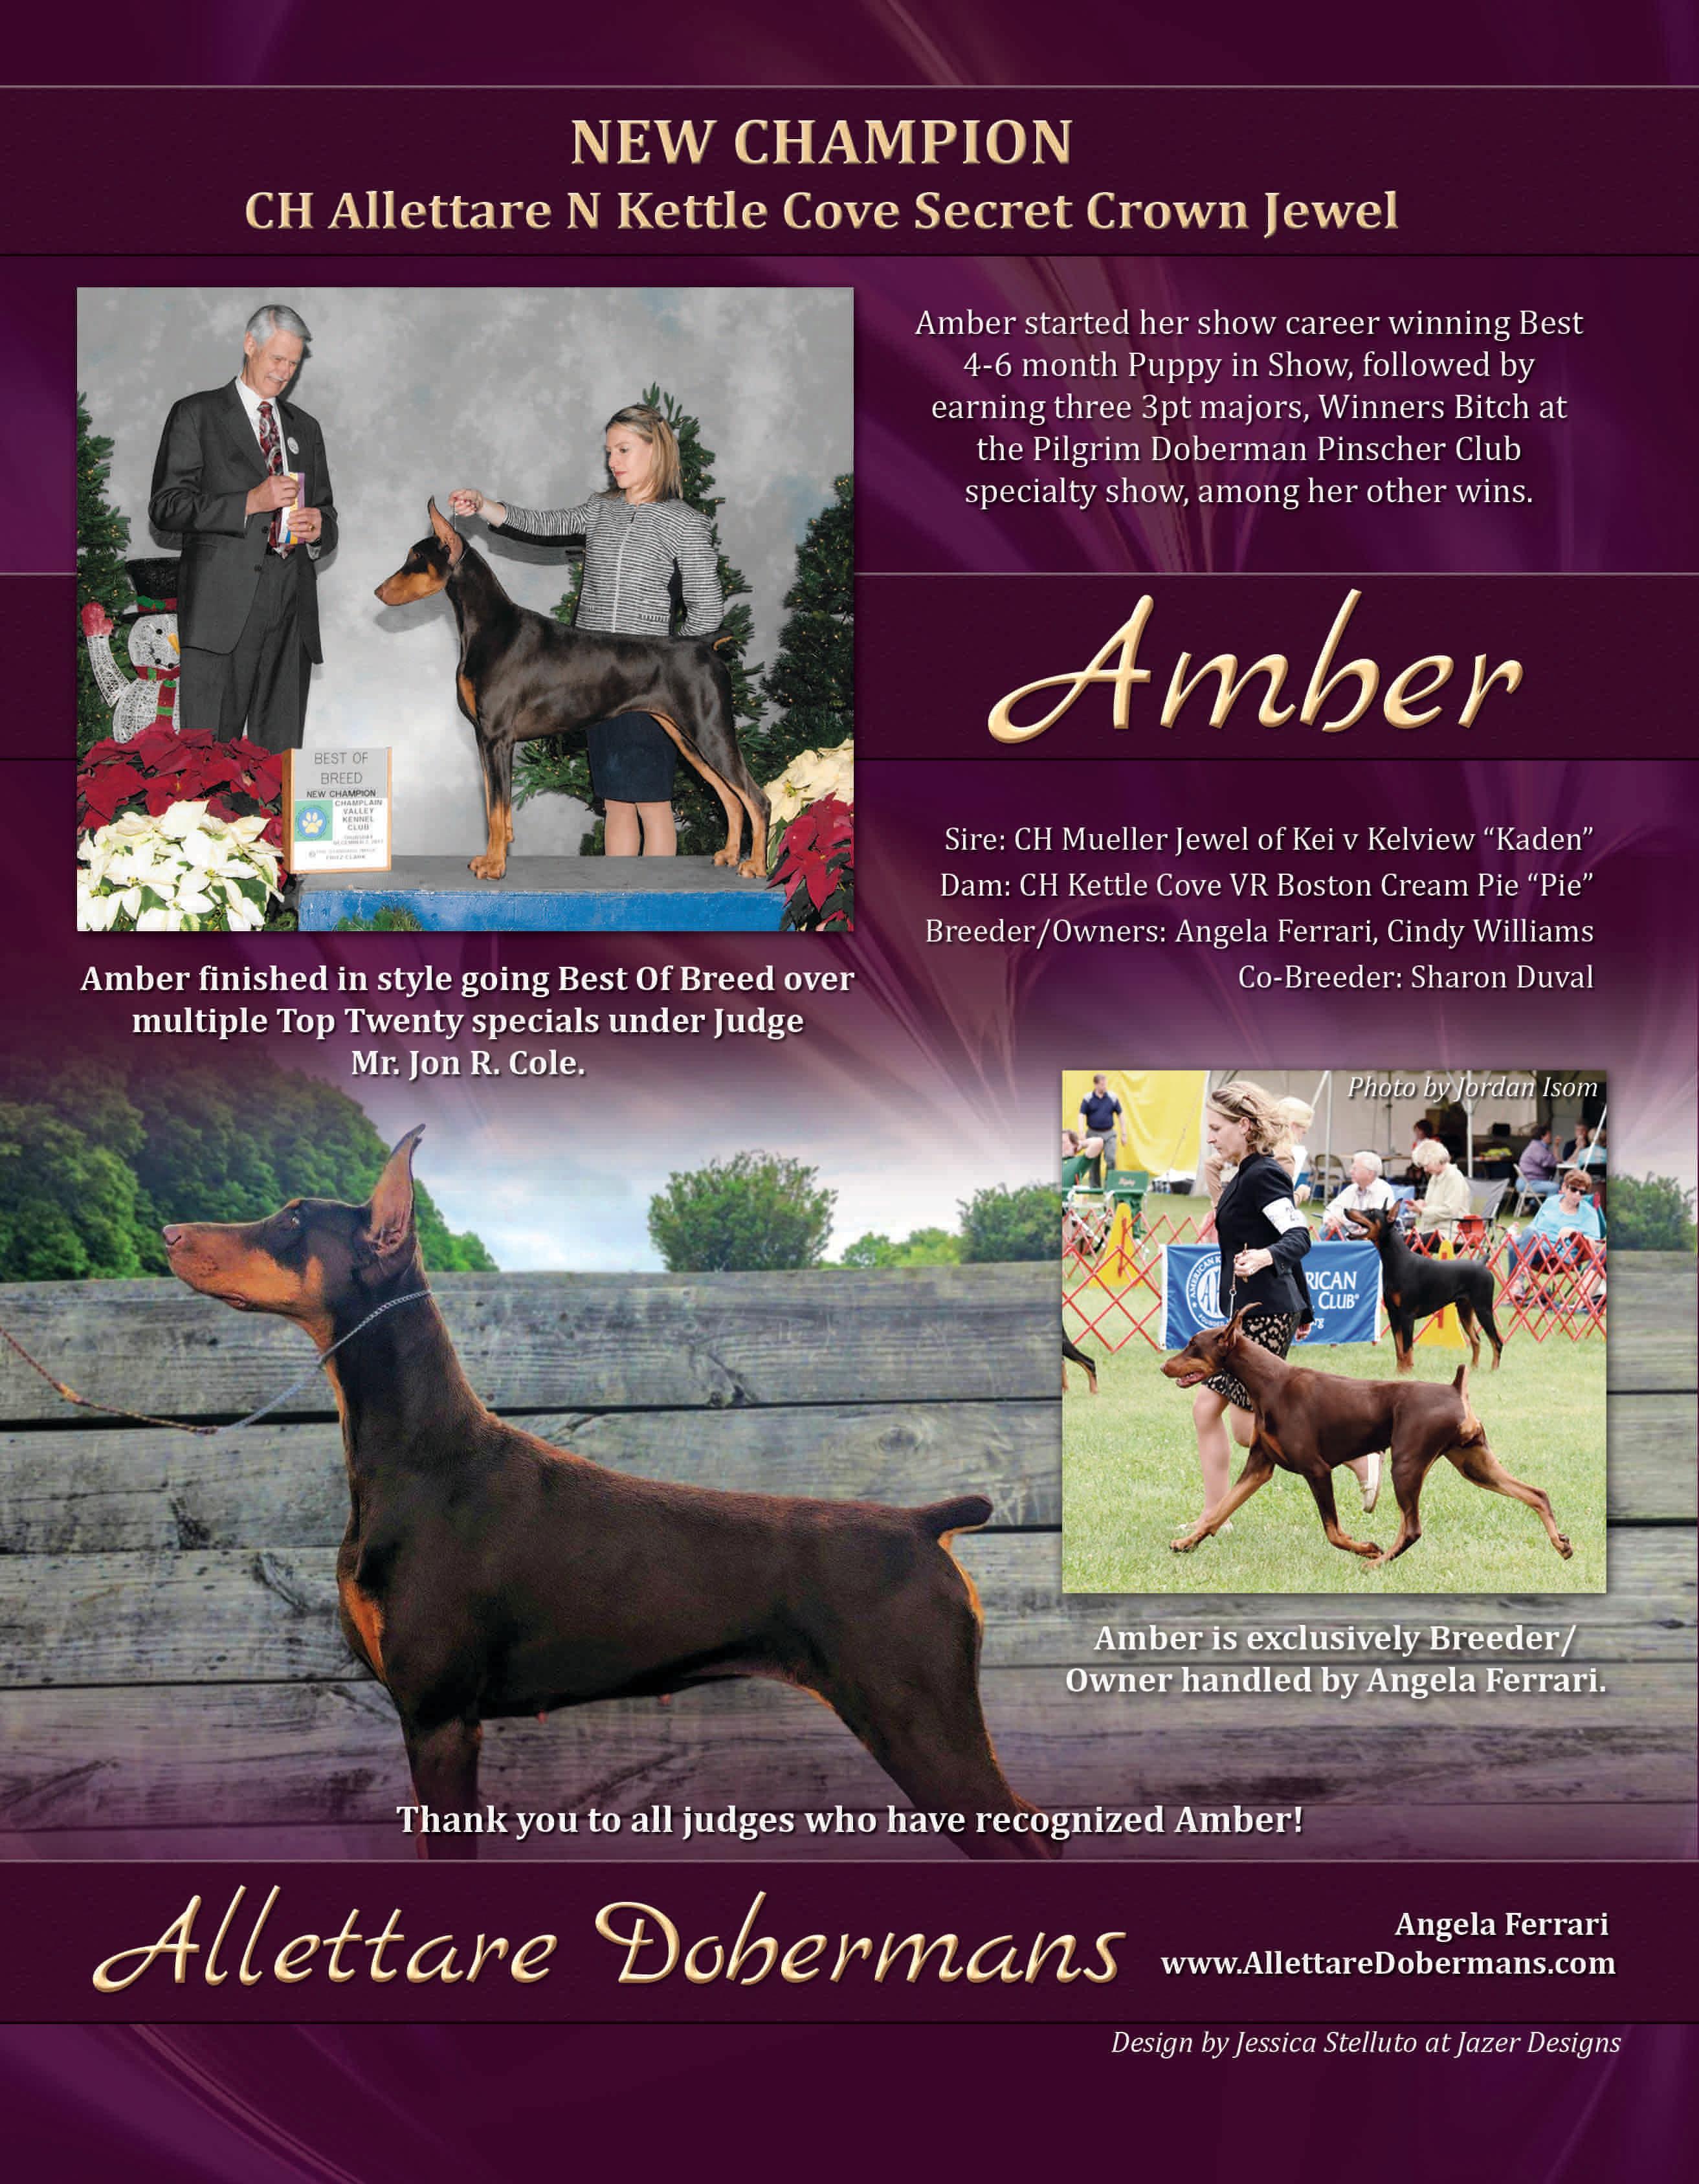 New Champion Amber